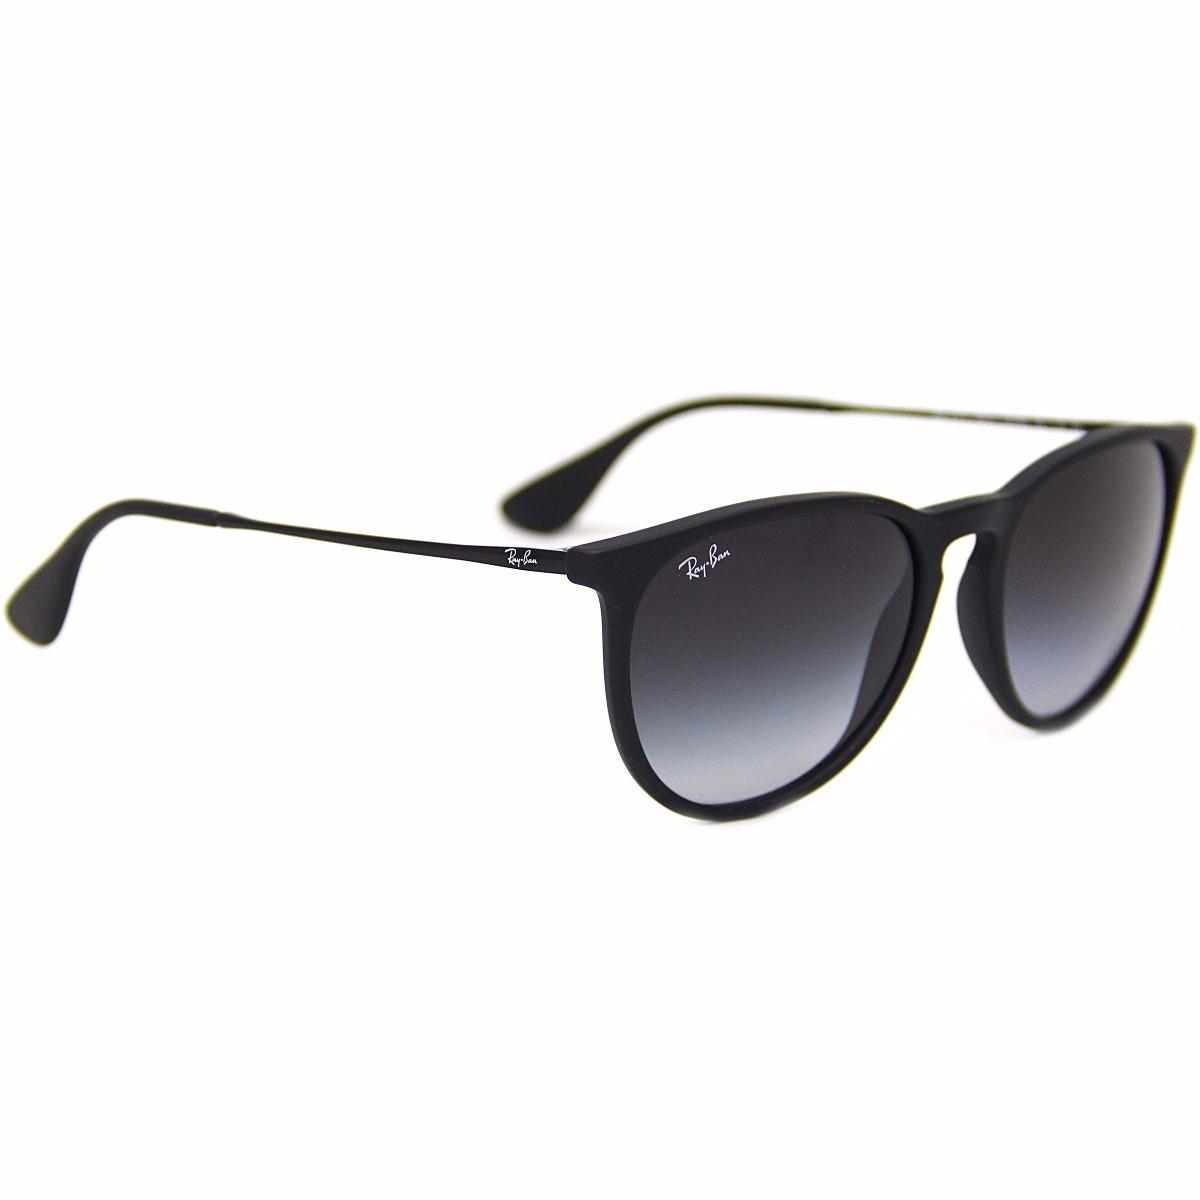 Óculos Feminino Sol Ray Ban 4171 Erika Cores... - R  449,99 em ... cbd54ea19b